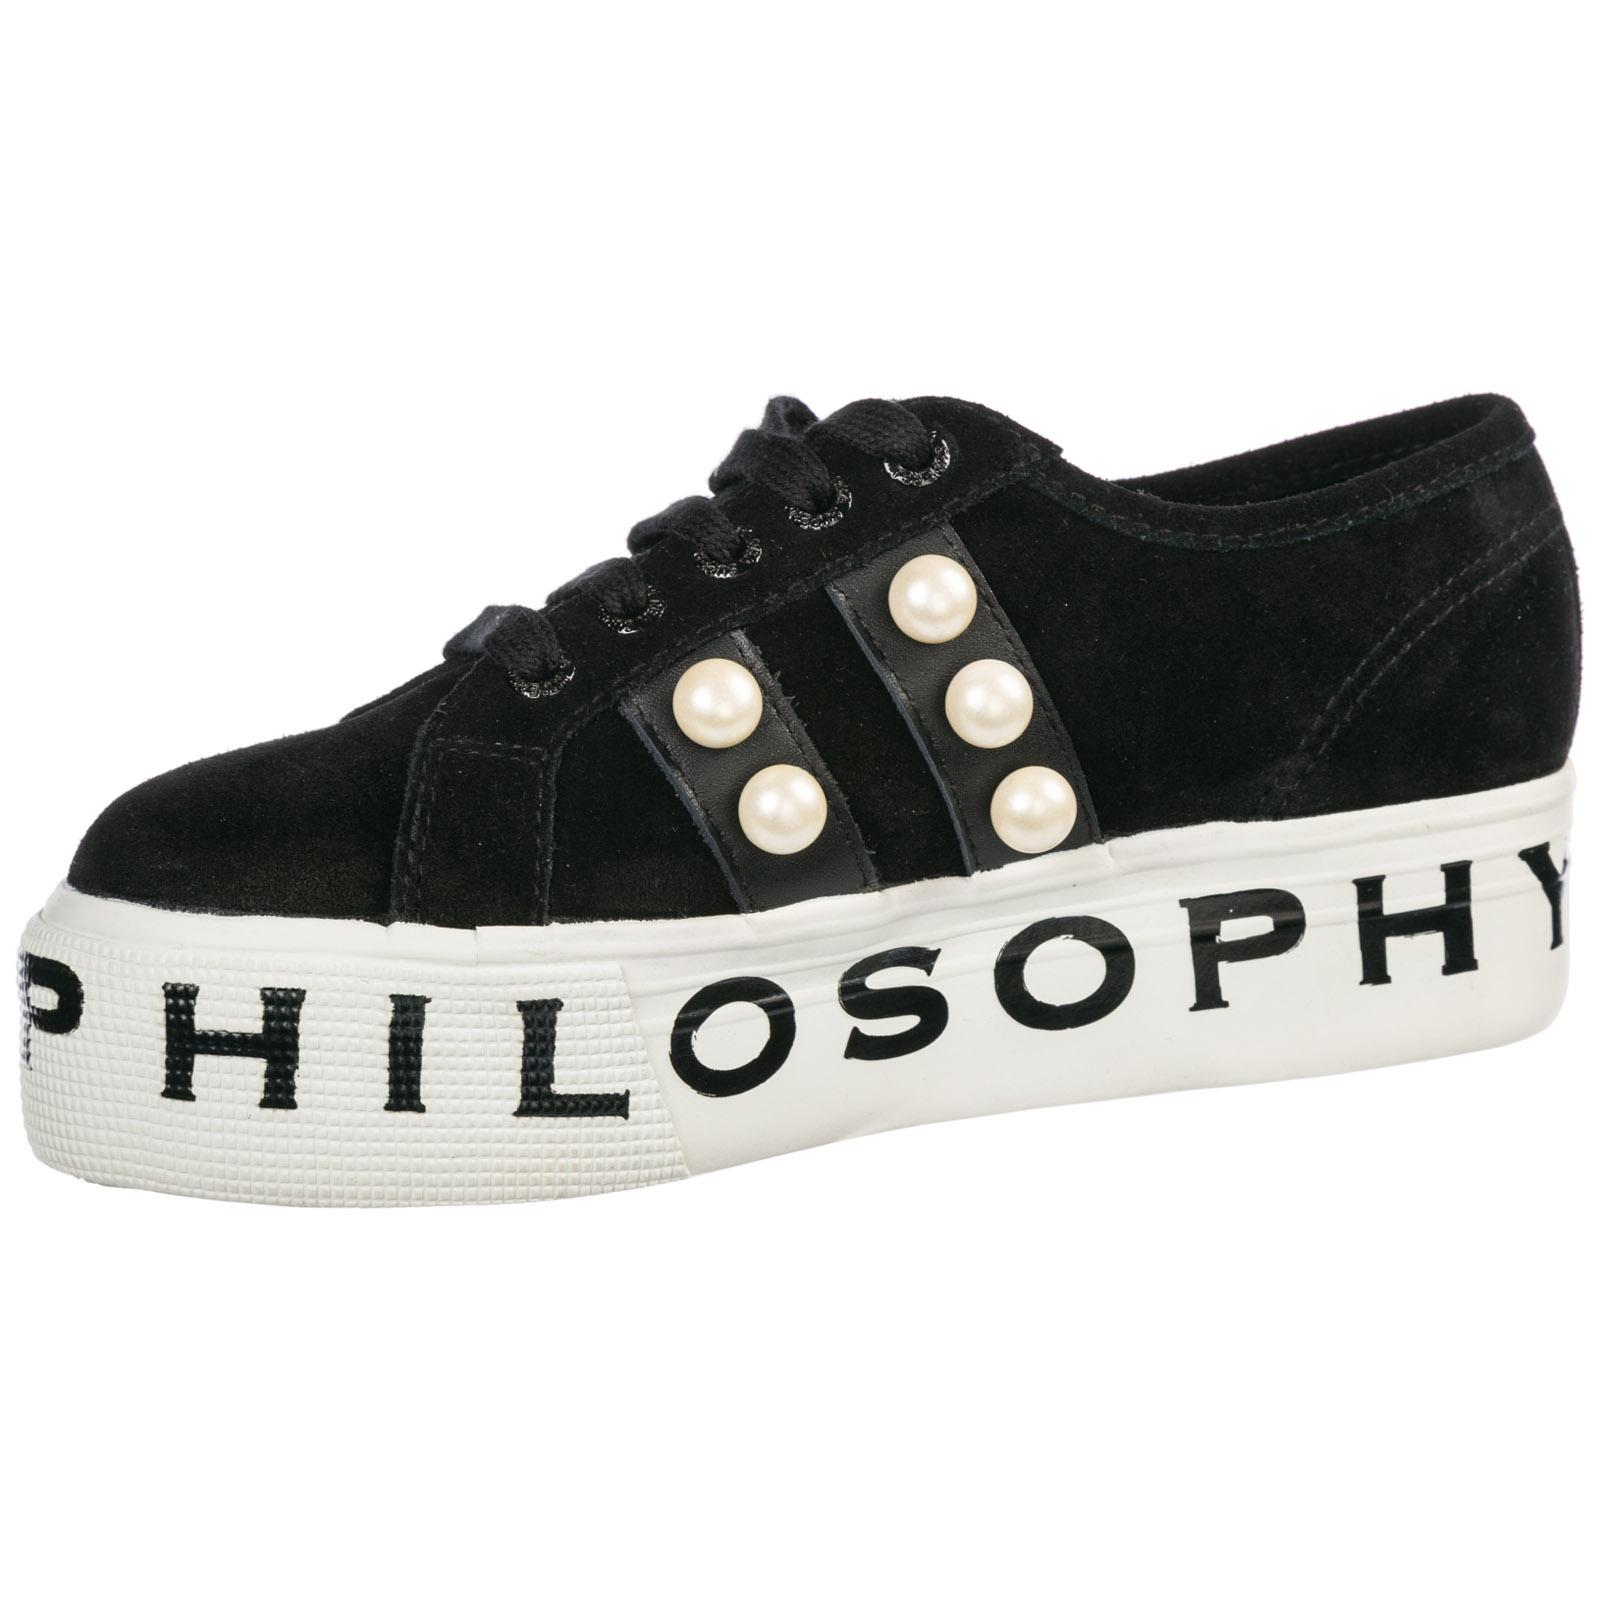 Sneakers Philosophy di Lorenzo Serafini Superga J32027174055535 nero ... 998081a7fbe